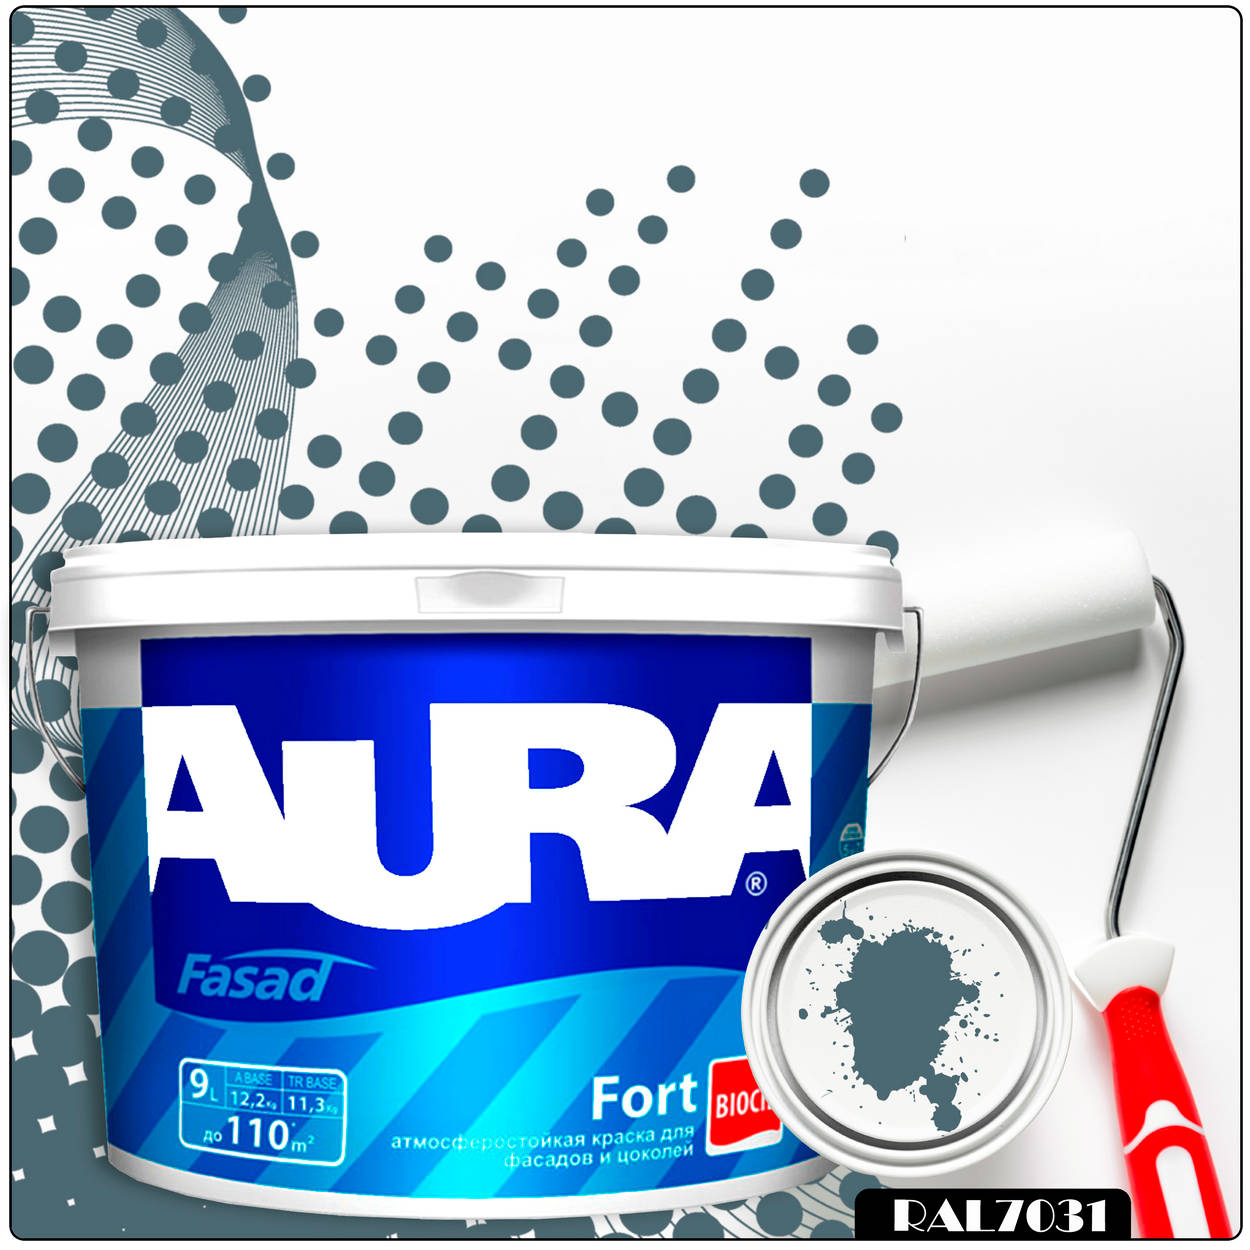 Фото 21 - Краска Aura Fasad Fort, RAL 7031 Сине-серый, латексная, матовая, для фасада и цоколей, 9л, Аура.